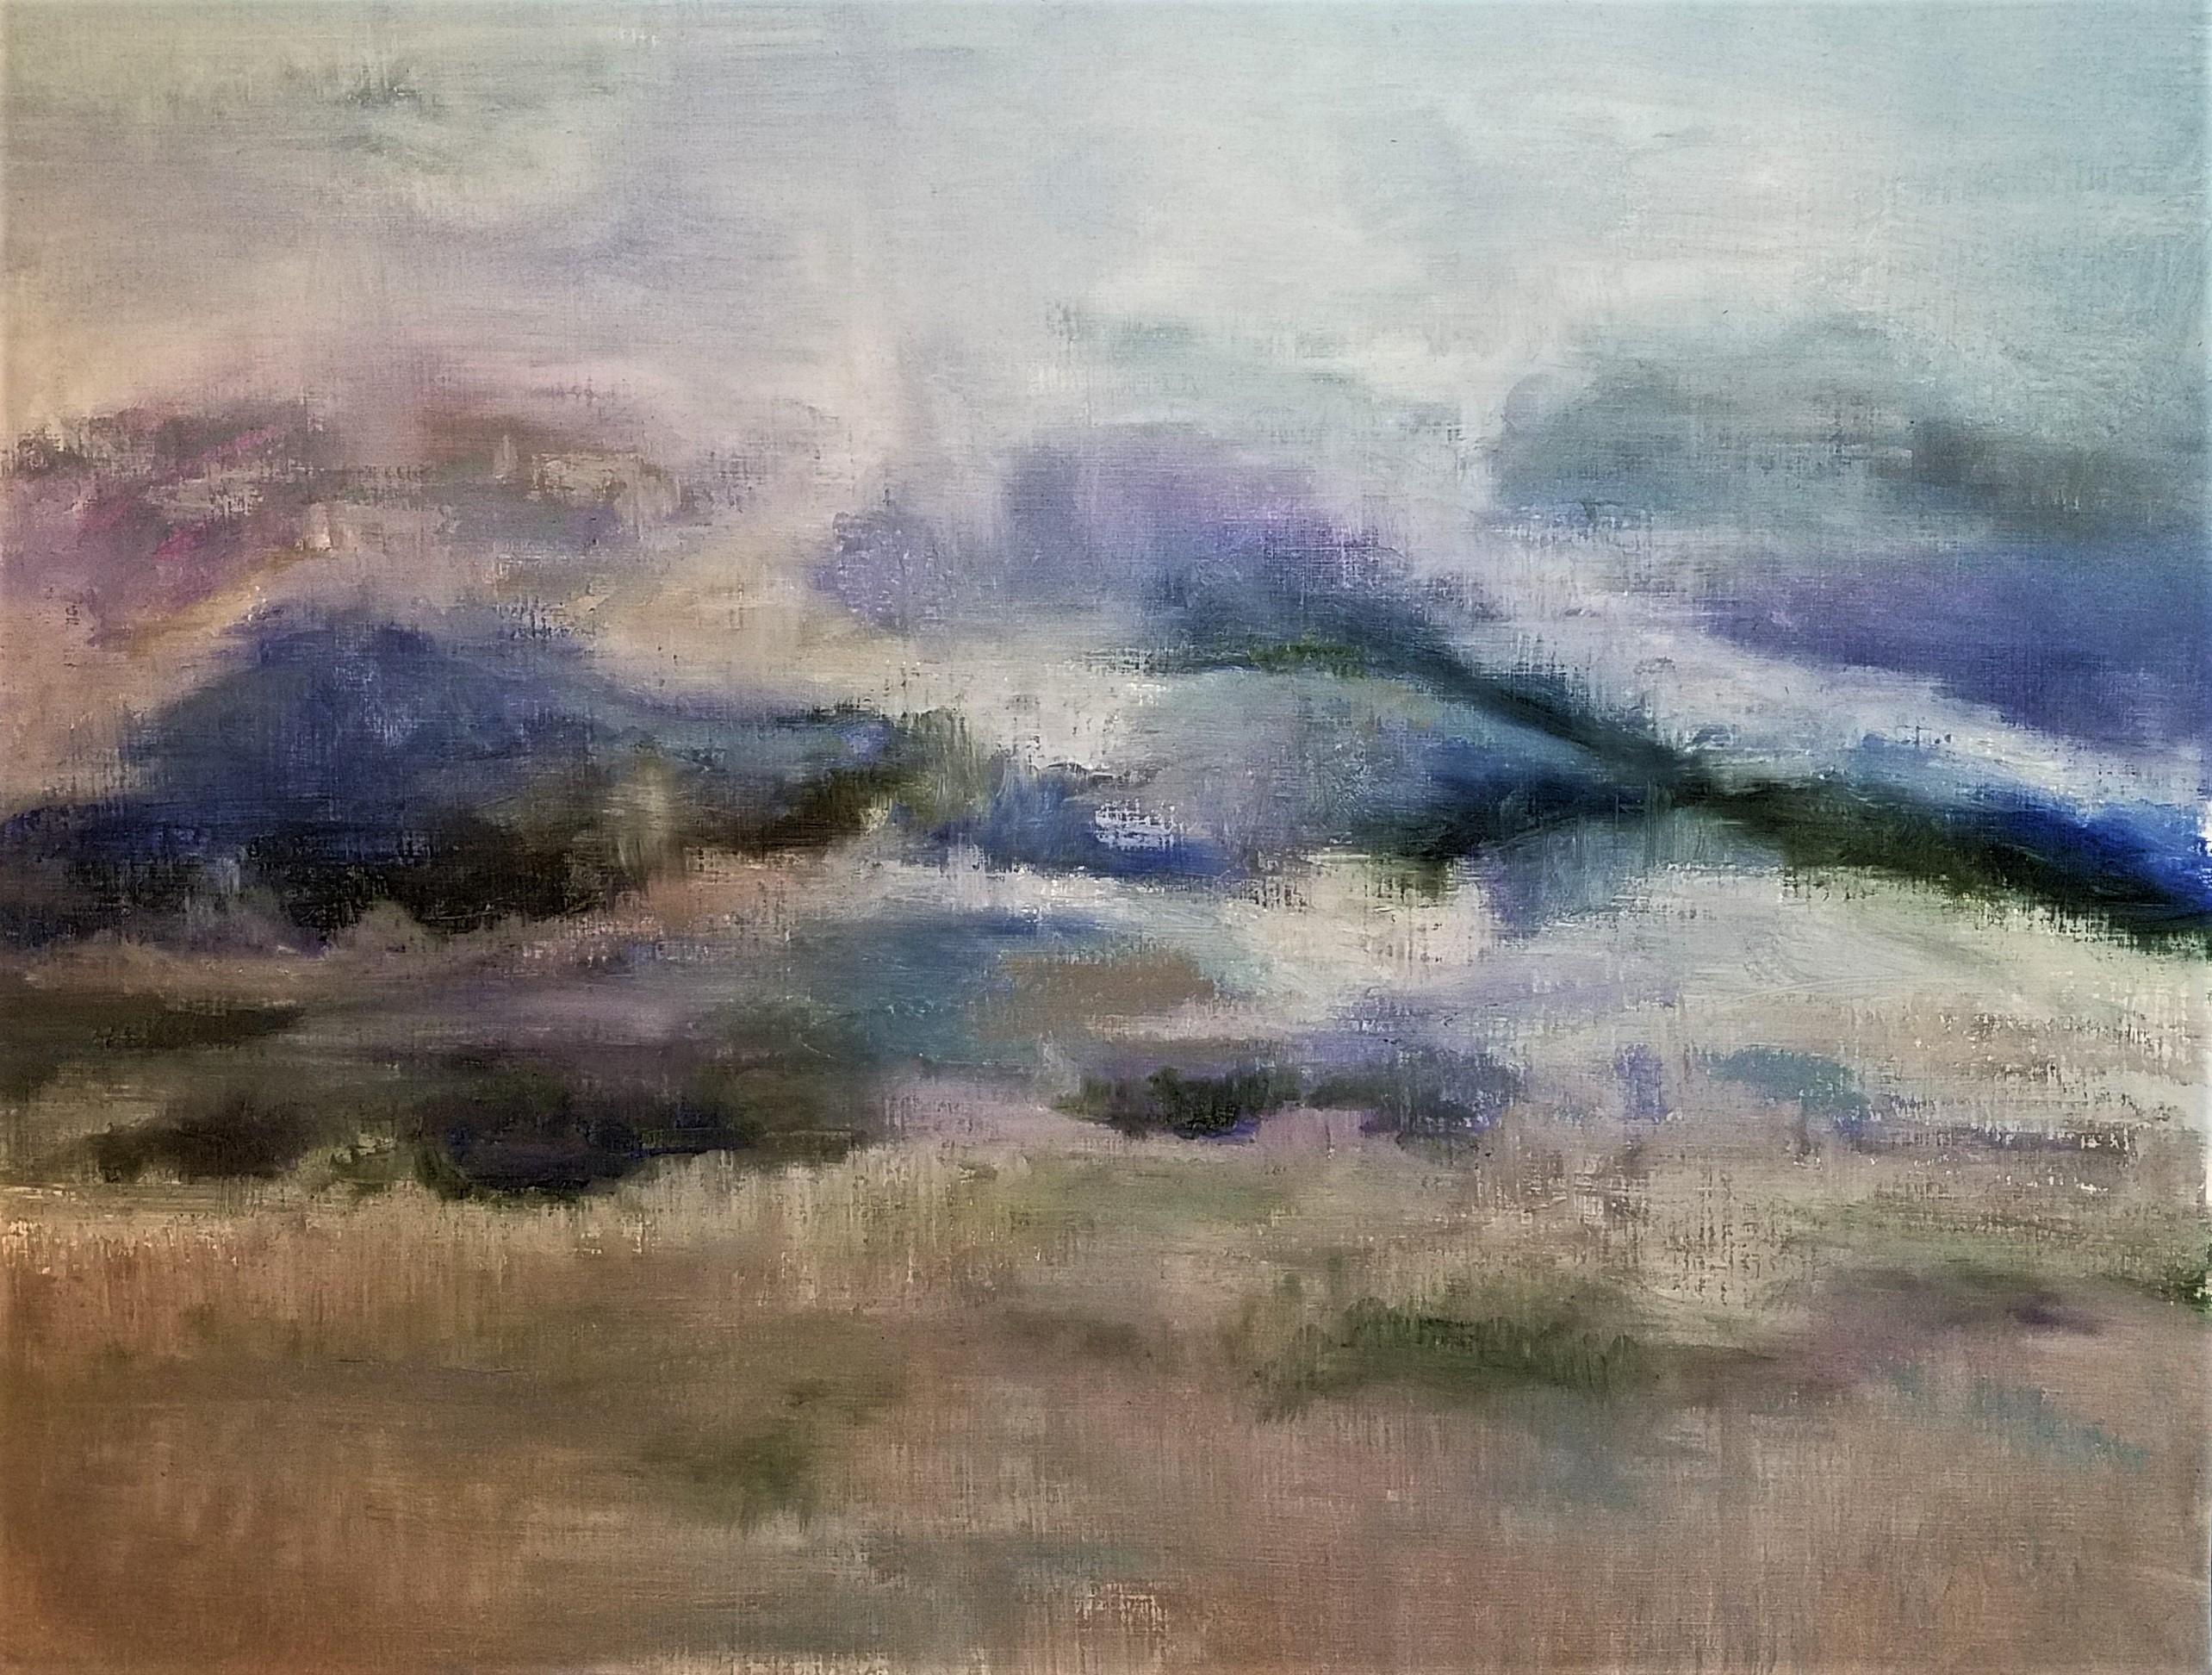 Misty Mountains, K.Willingham